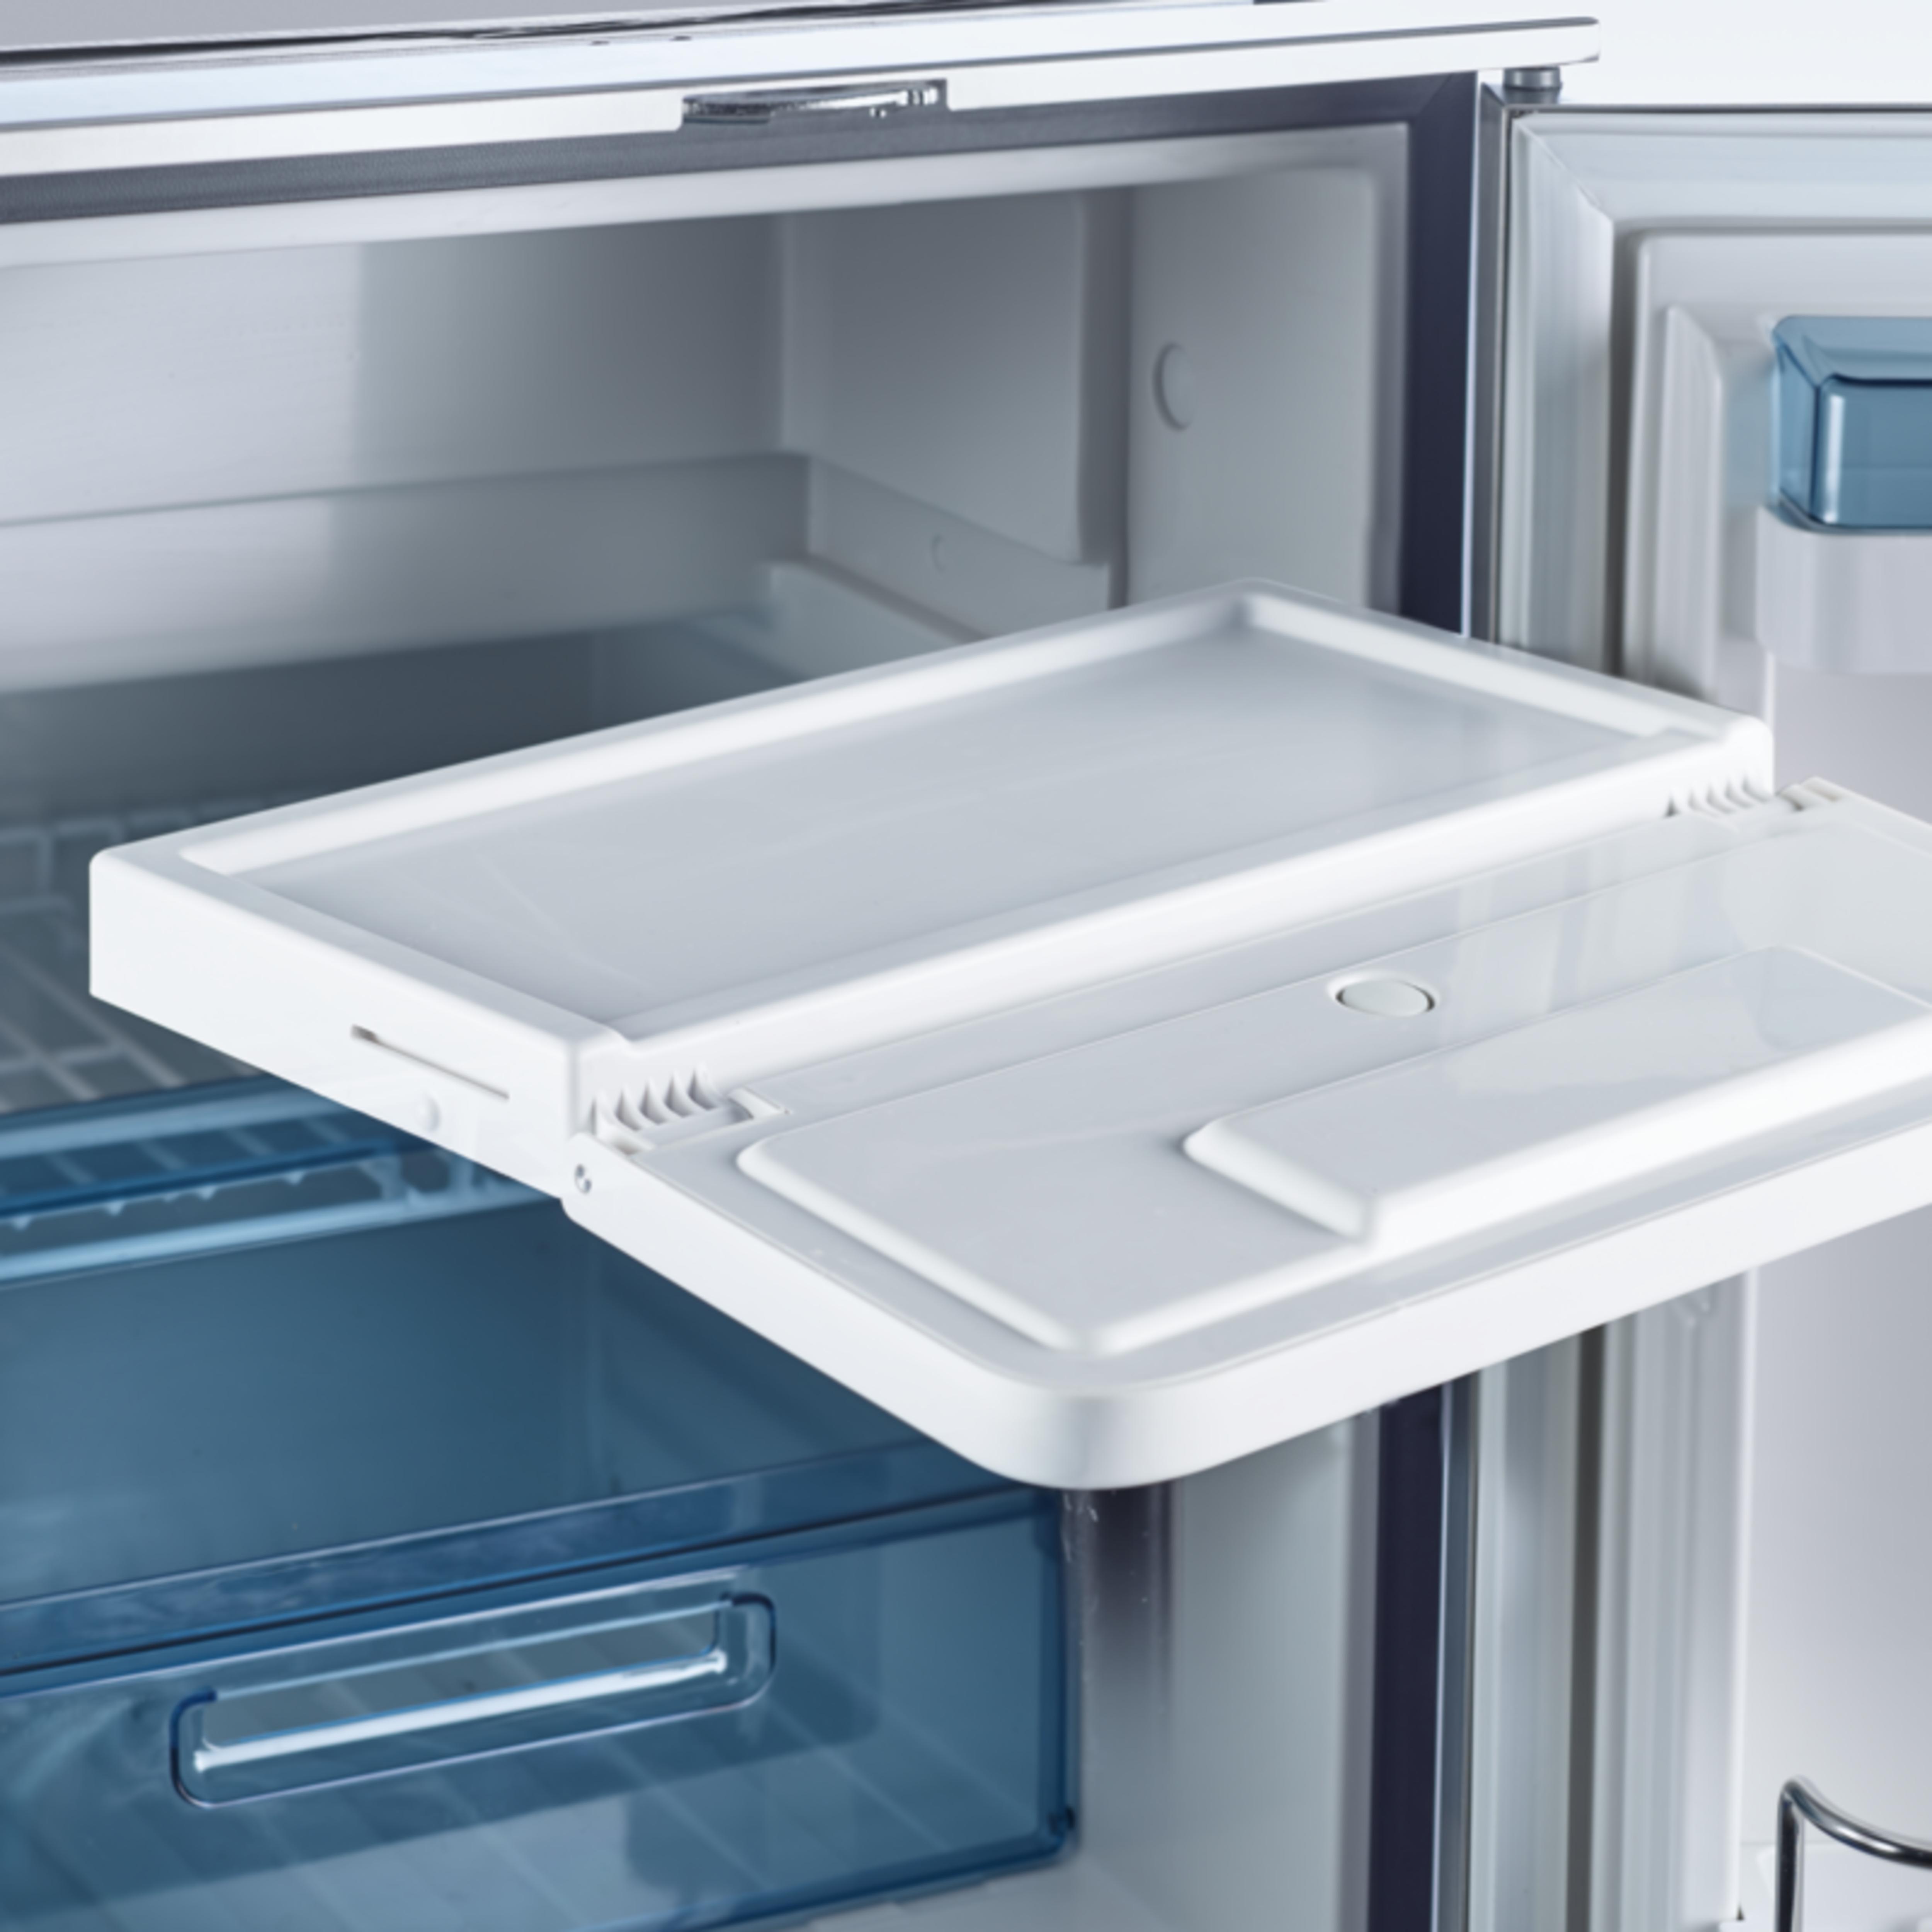 Removable freezer